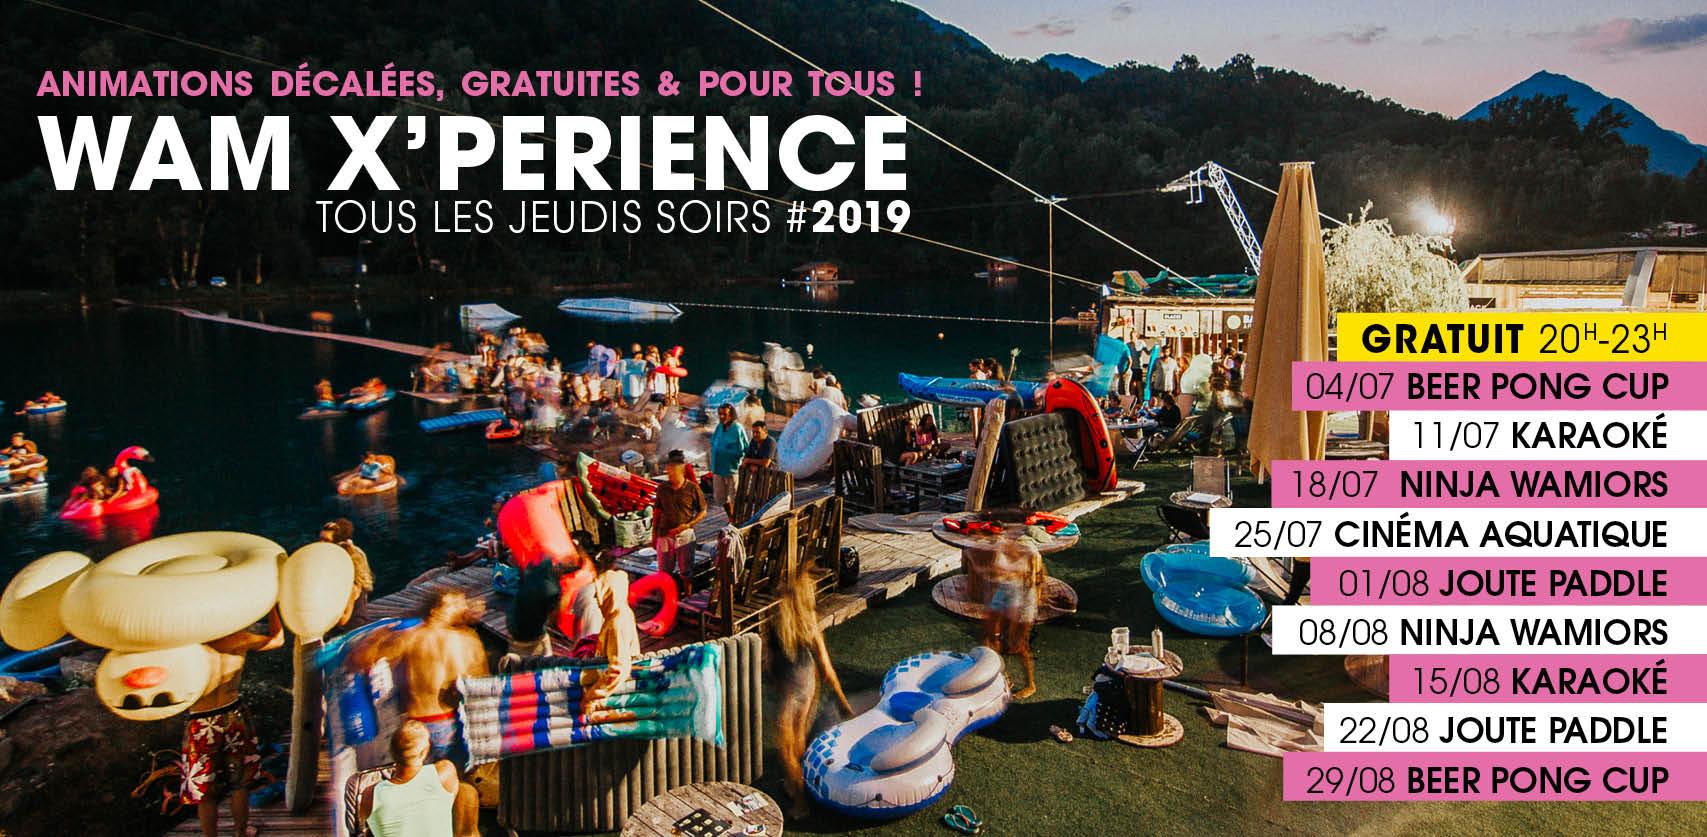 WAM XPERIENCE 2019 - Web Banner - 1707x837